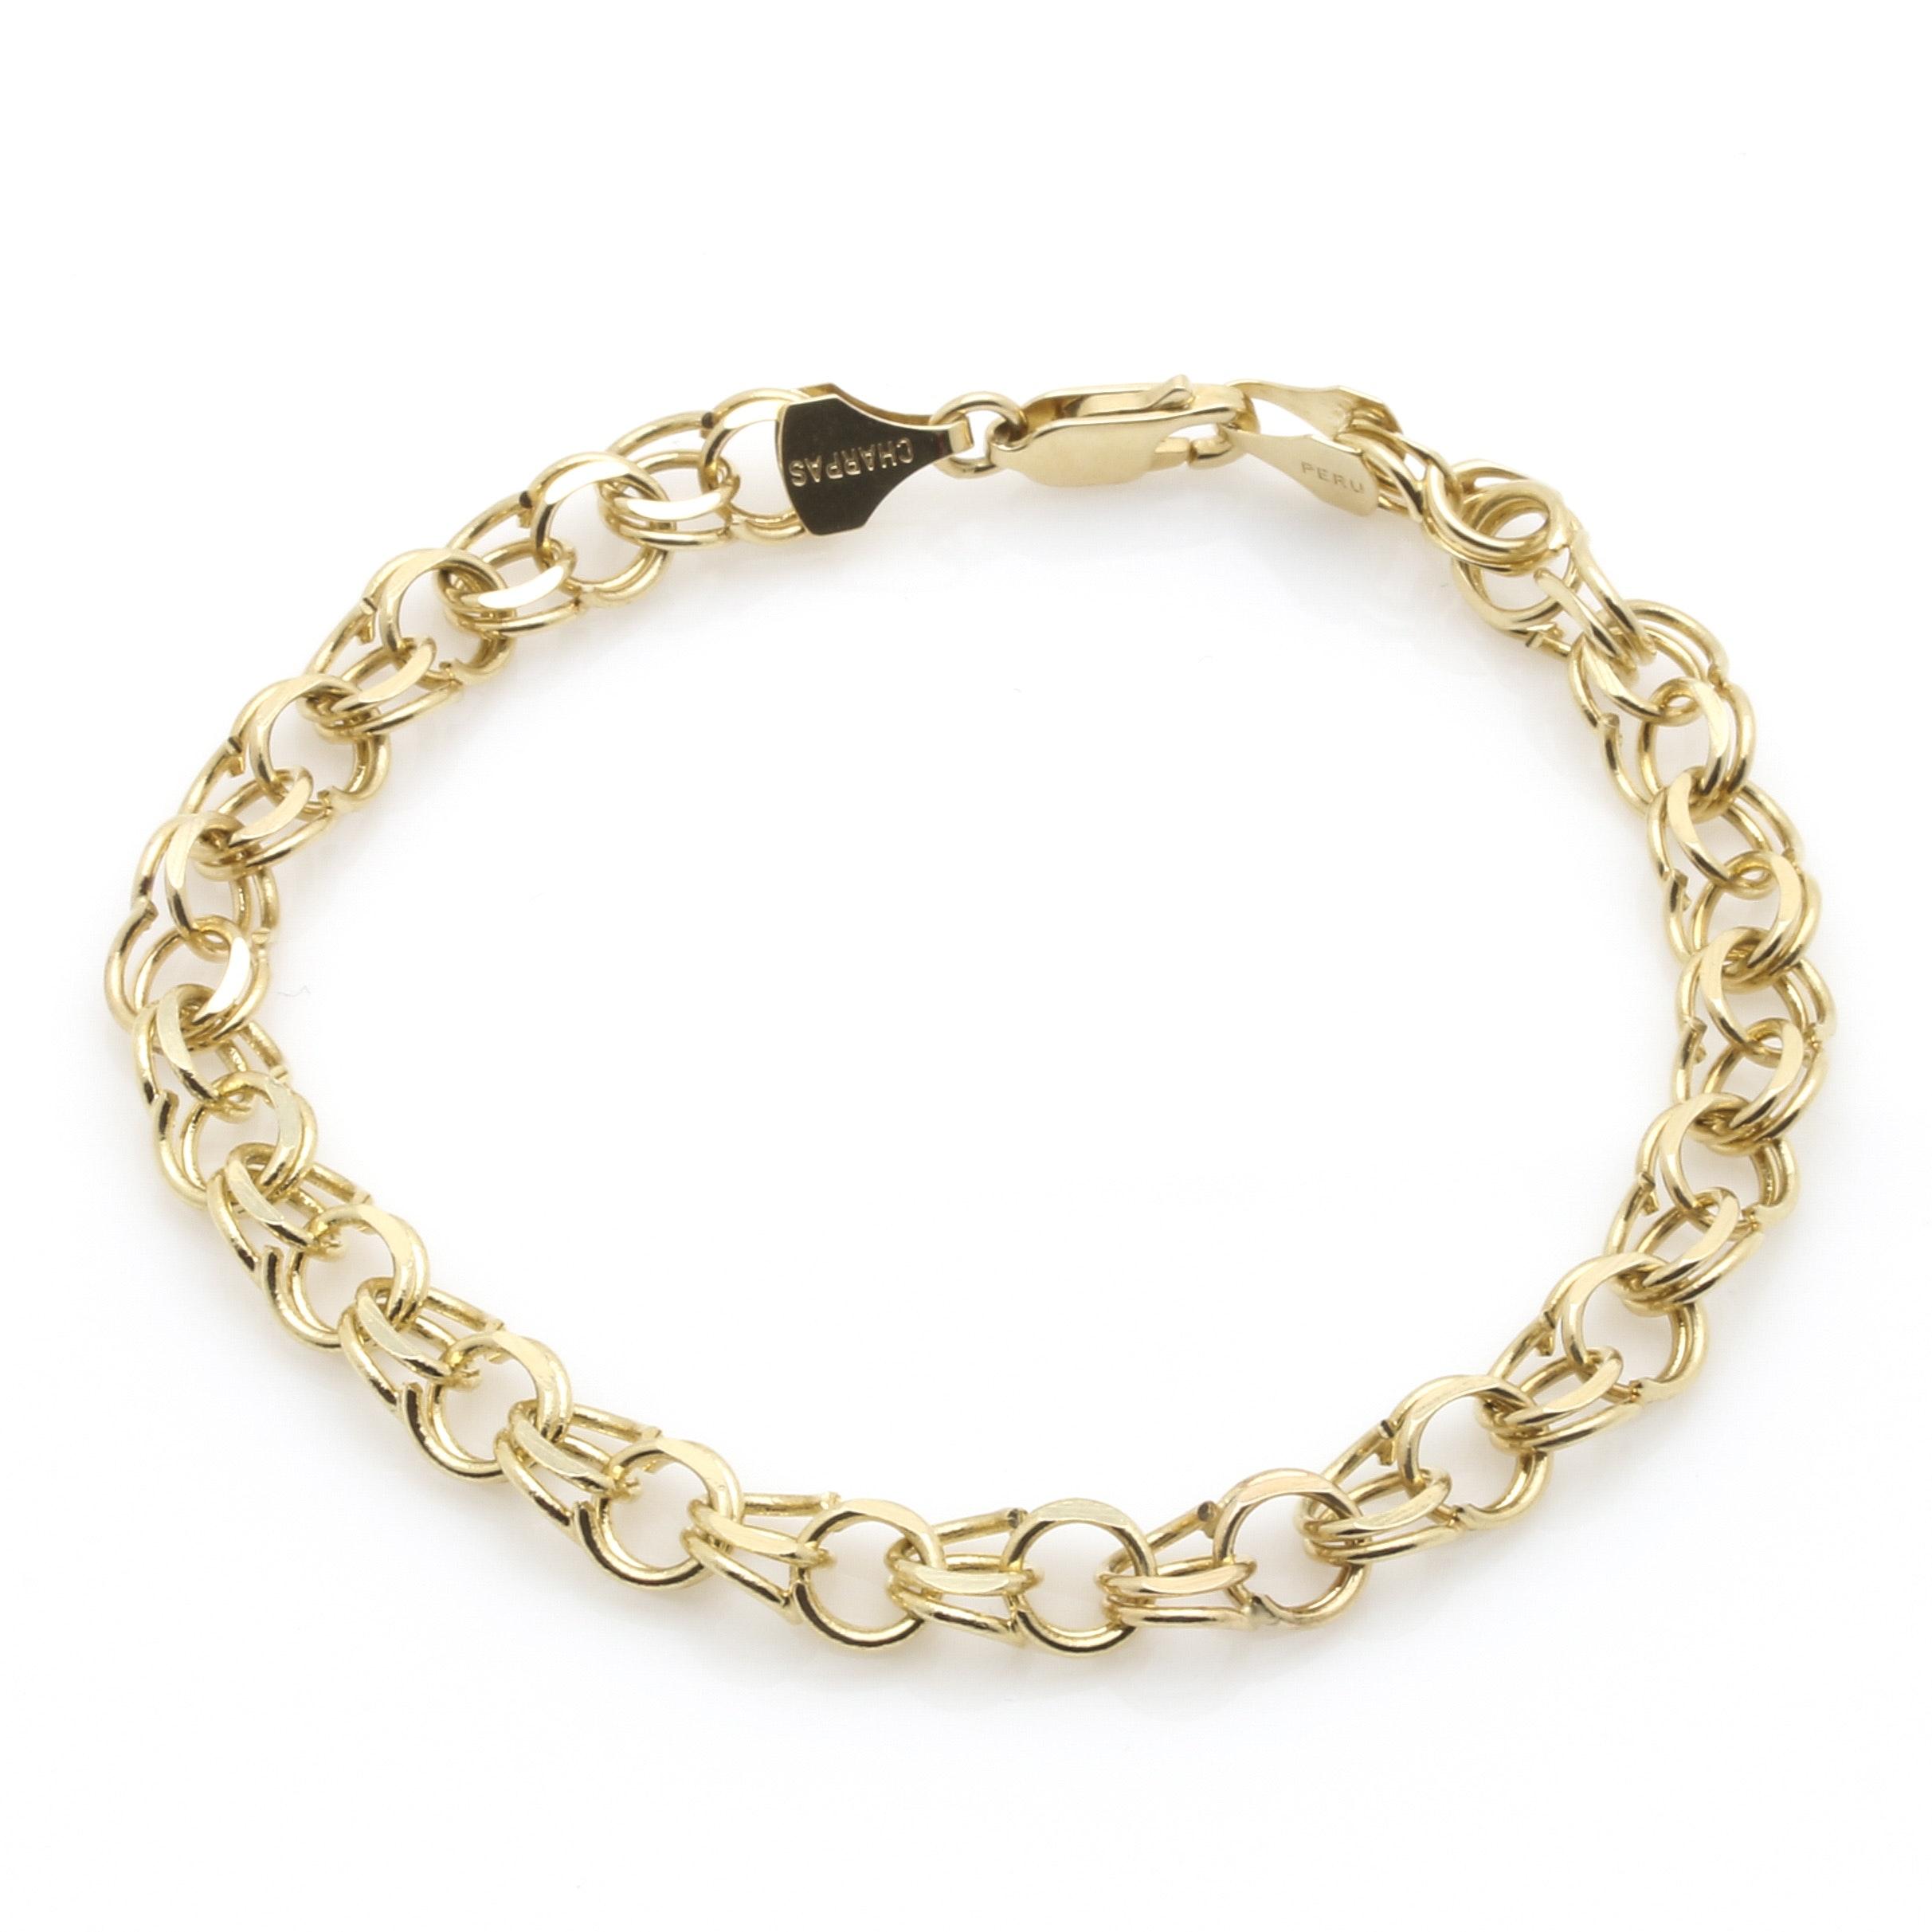 14K Yellow Gold Fancy Cable Link Bracelet